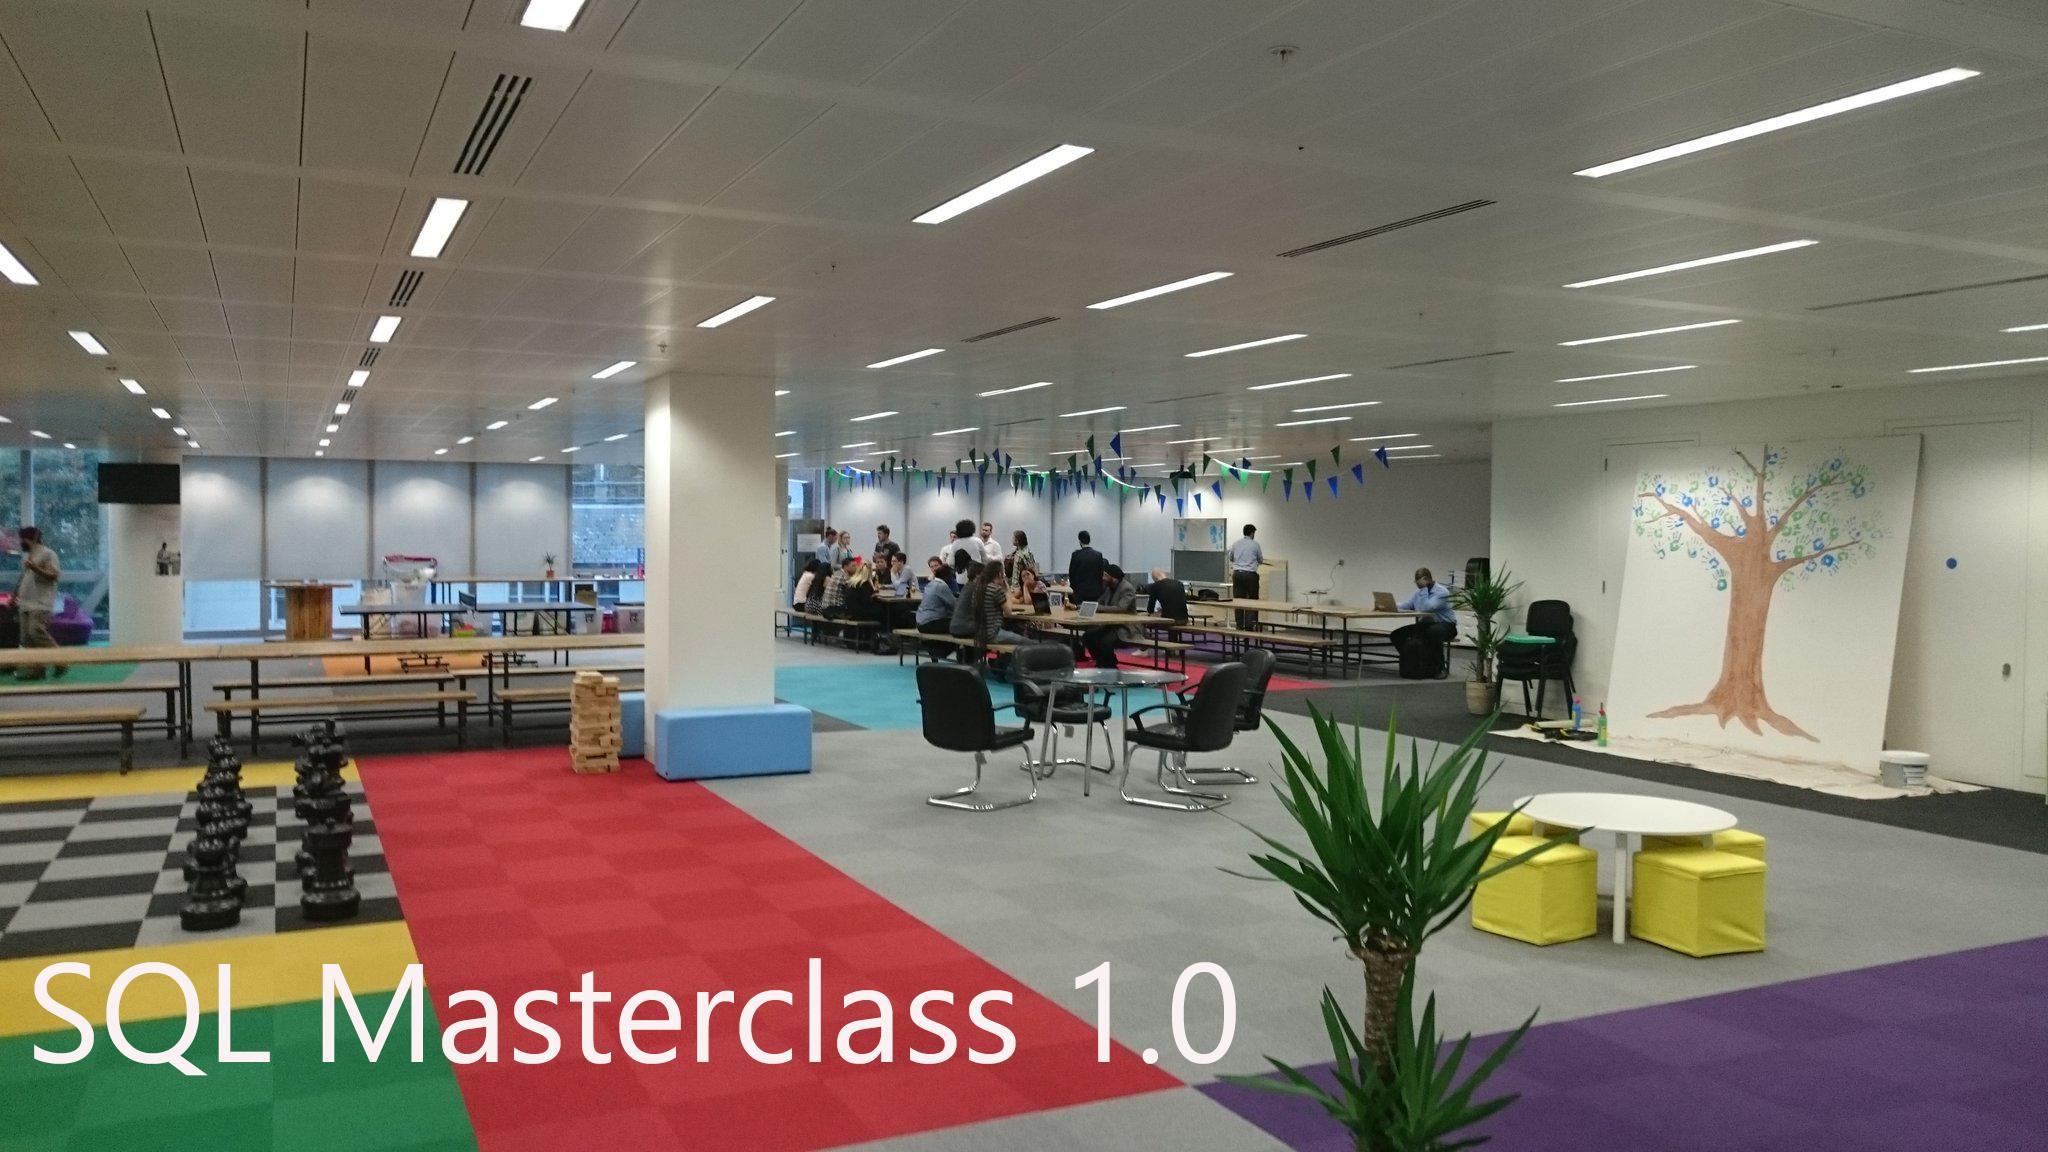 SQL Masterclass - 1.0